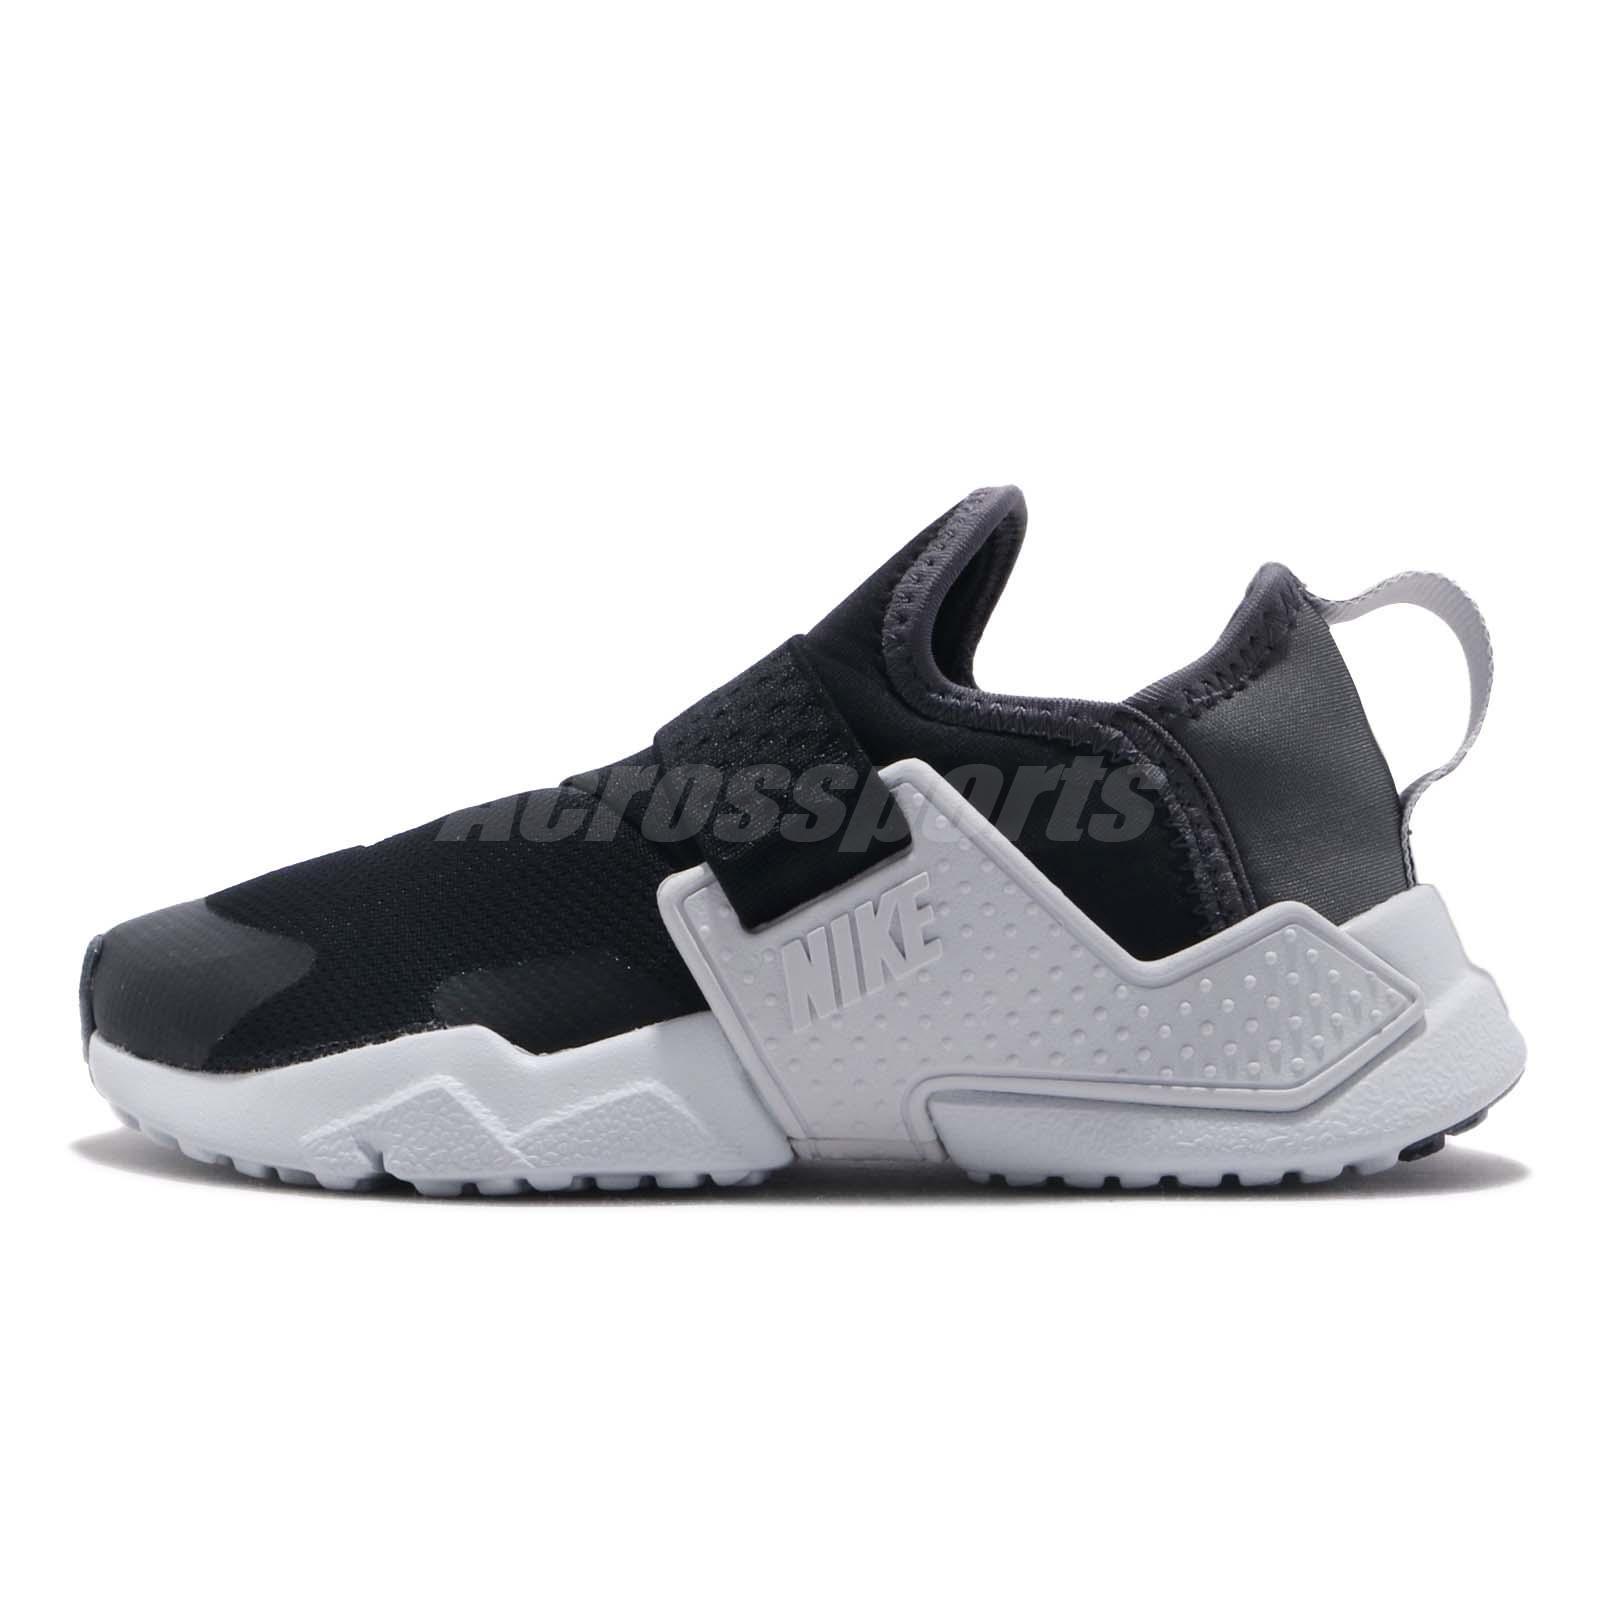 quality design f08bd 0ad2c Nike Huarache Extreme SE PS Black Silver Grey Kid Preschool Shoes AQ7937-002